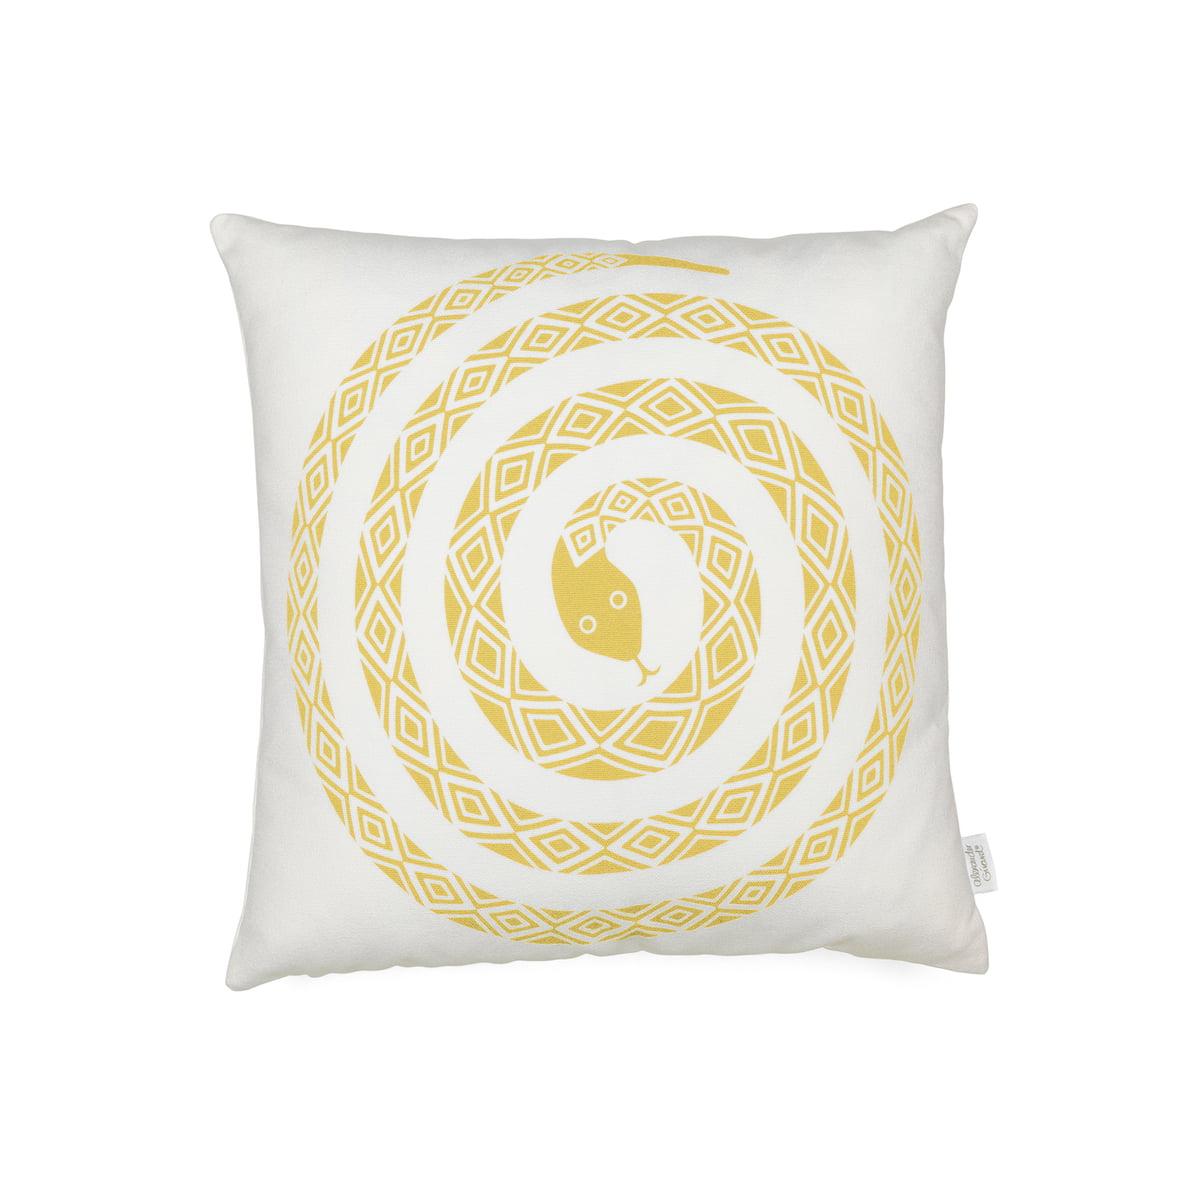 vitra graphic print pillow snake